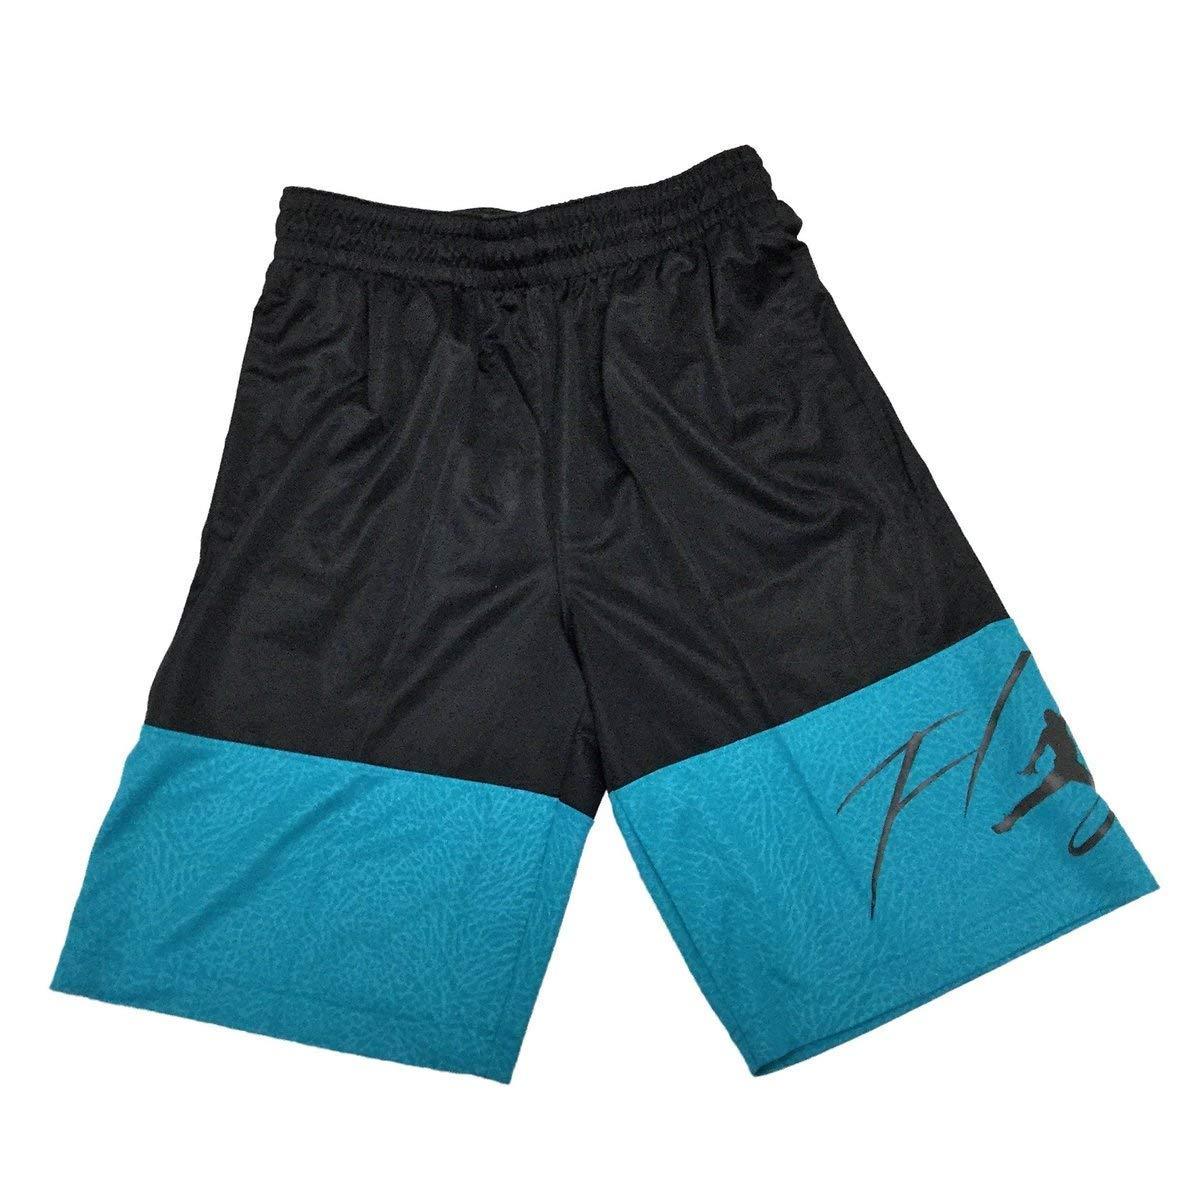 d7adc91d30c Amazon.com: Jordan Gx1 Basketball Shorts Mens: Clothing